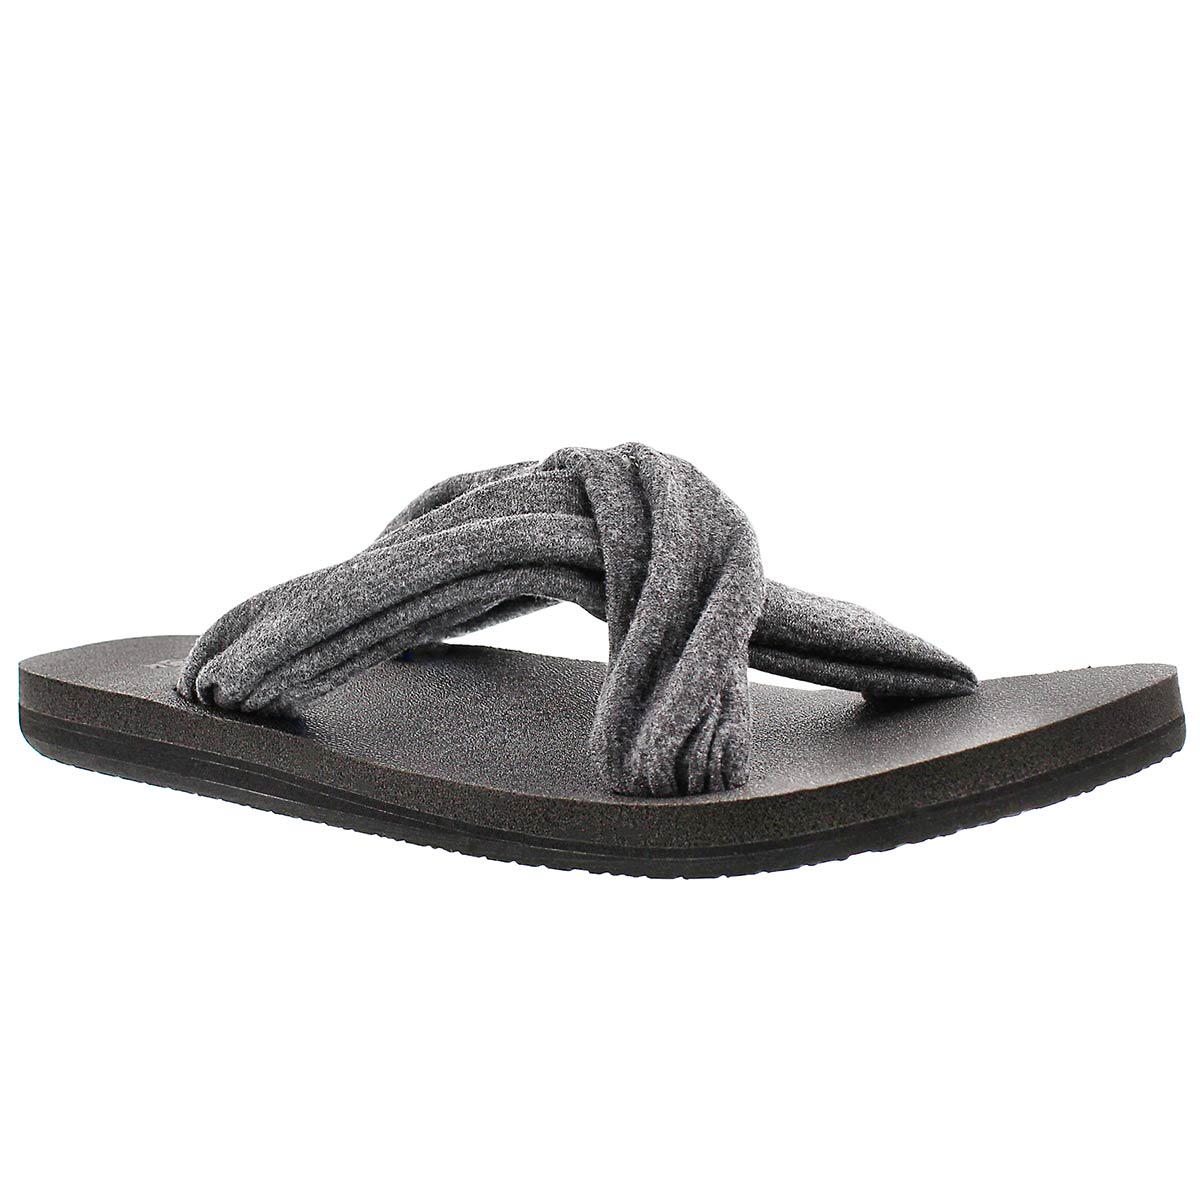 Lds Yoga X-Hale charcoal slide sandal